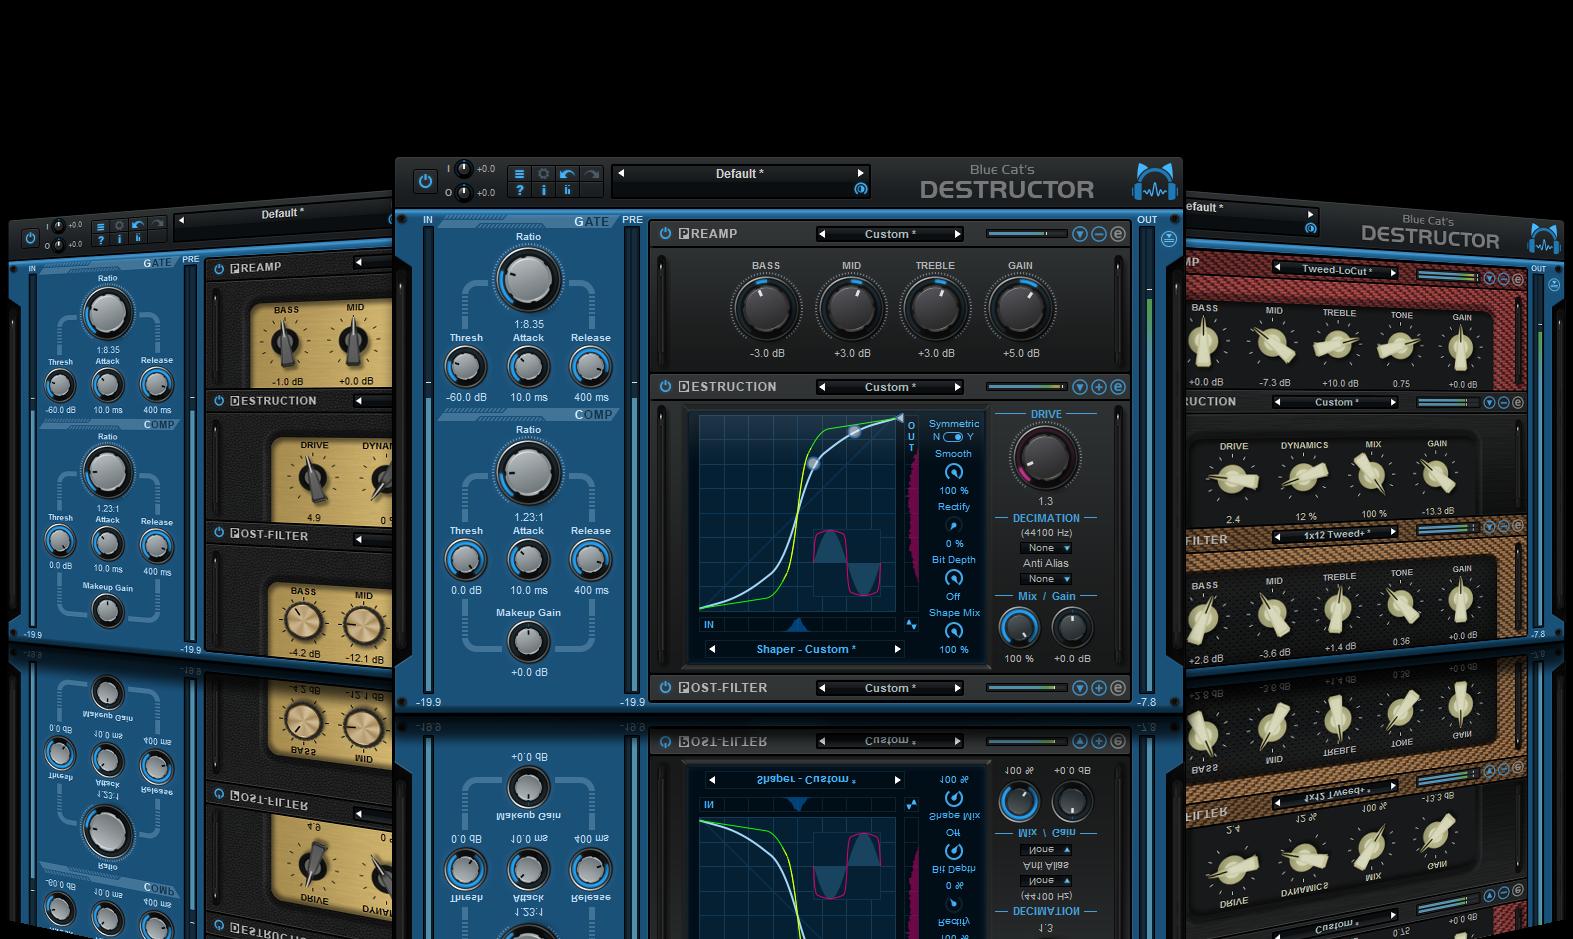 Blue Cat's Destructor – Now Available!